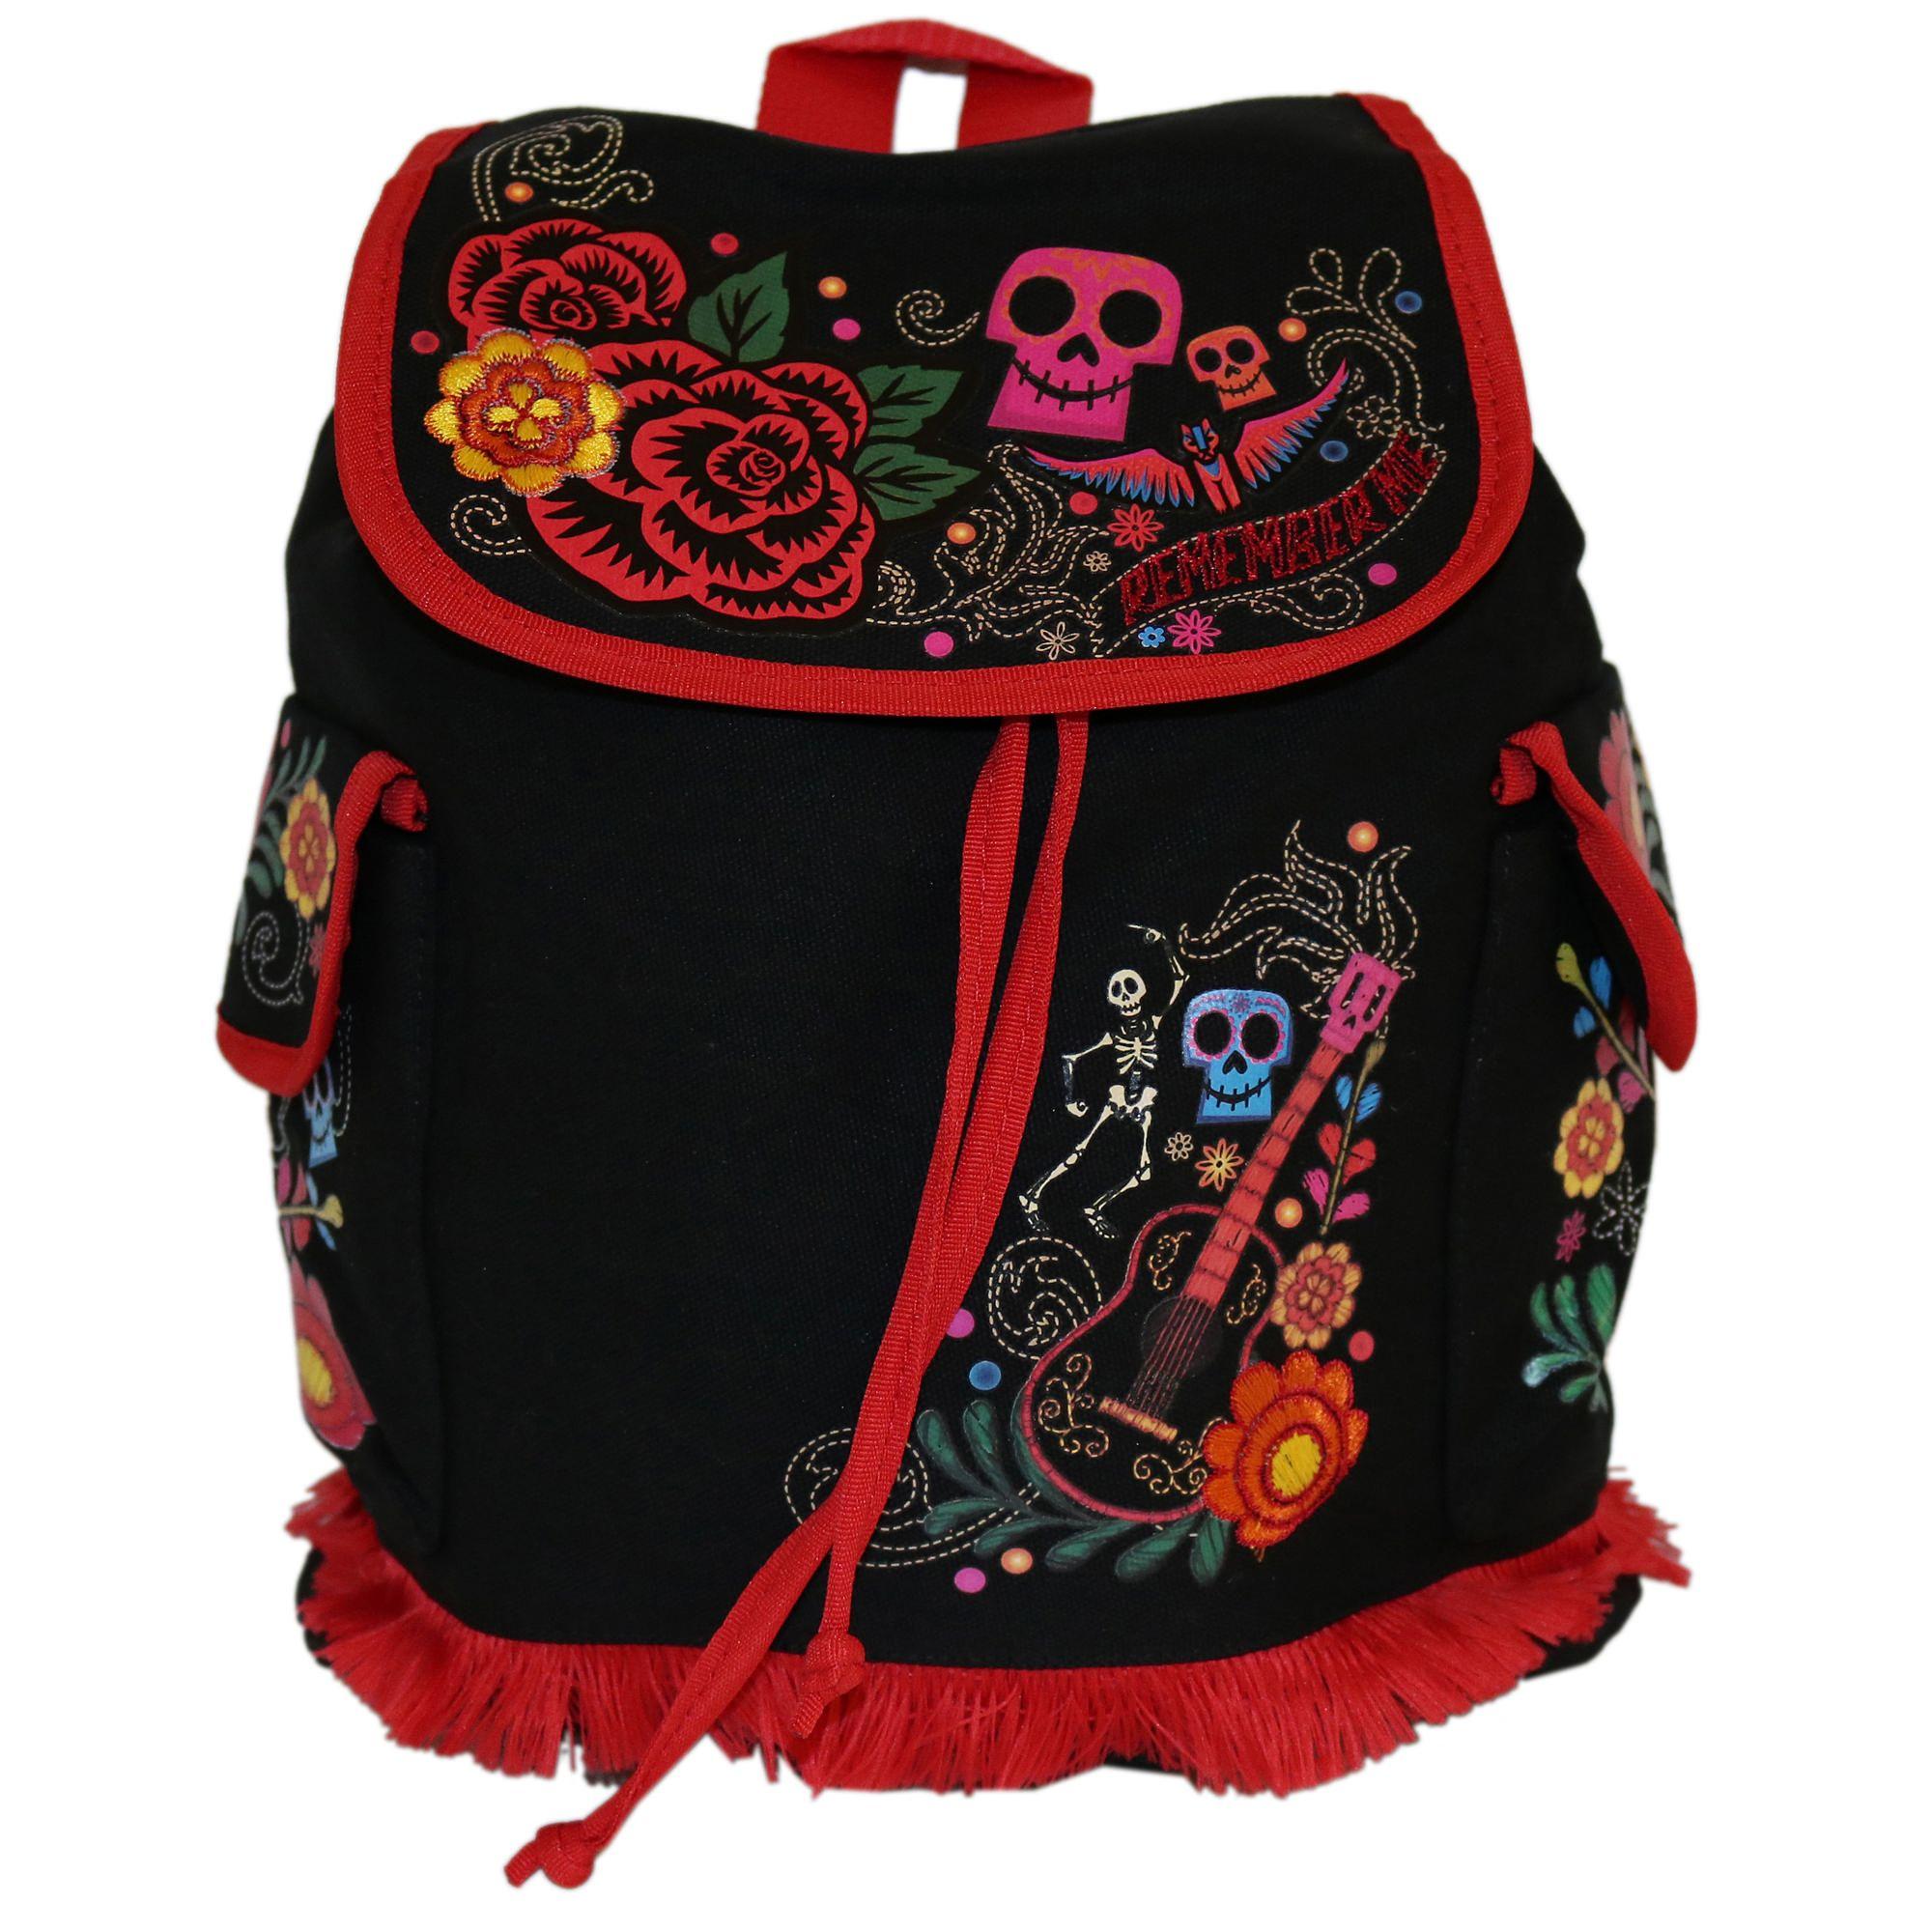 Disney Pixar Coco Fashion Rucksack 12-inch Backpack - unique fashion ...